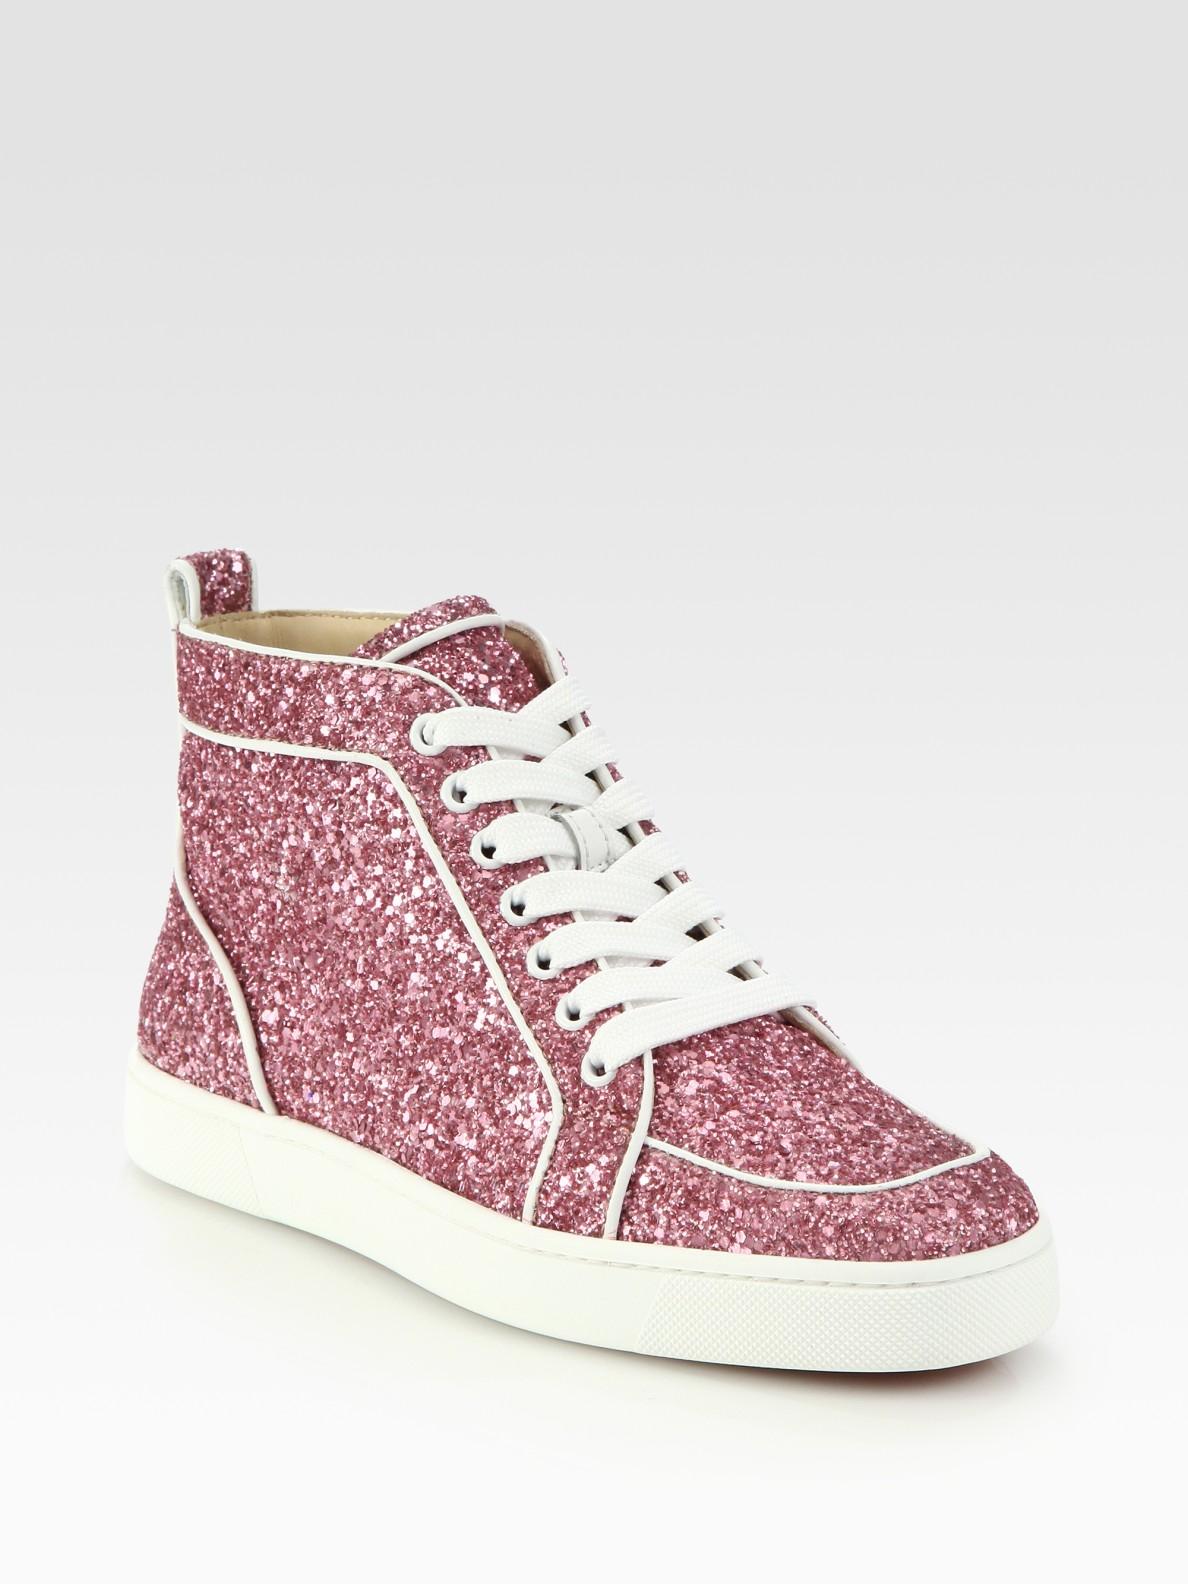 fba4c537583 free shipping christian louboutin glitter sneakers 701cf 355f1